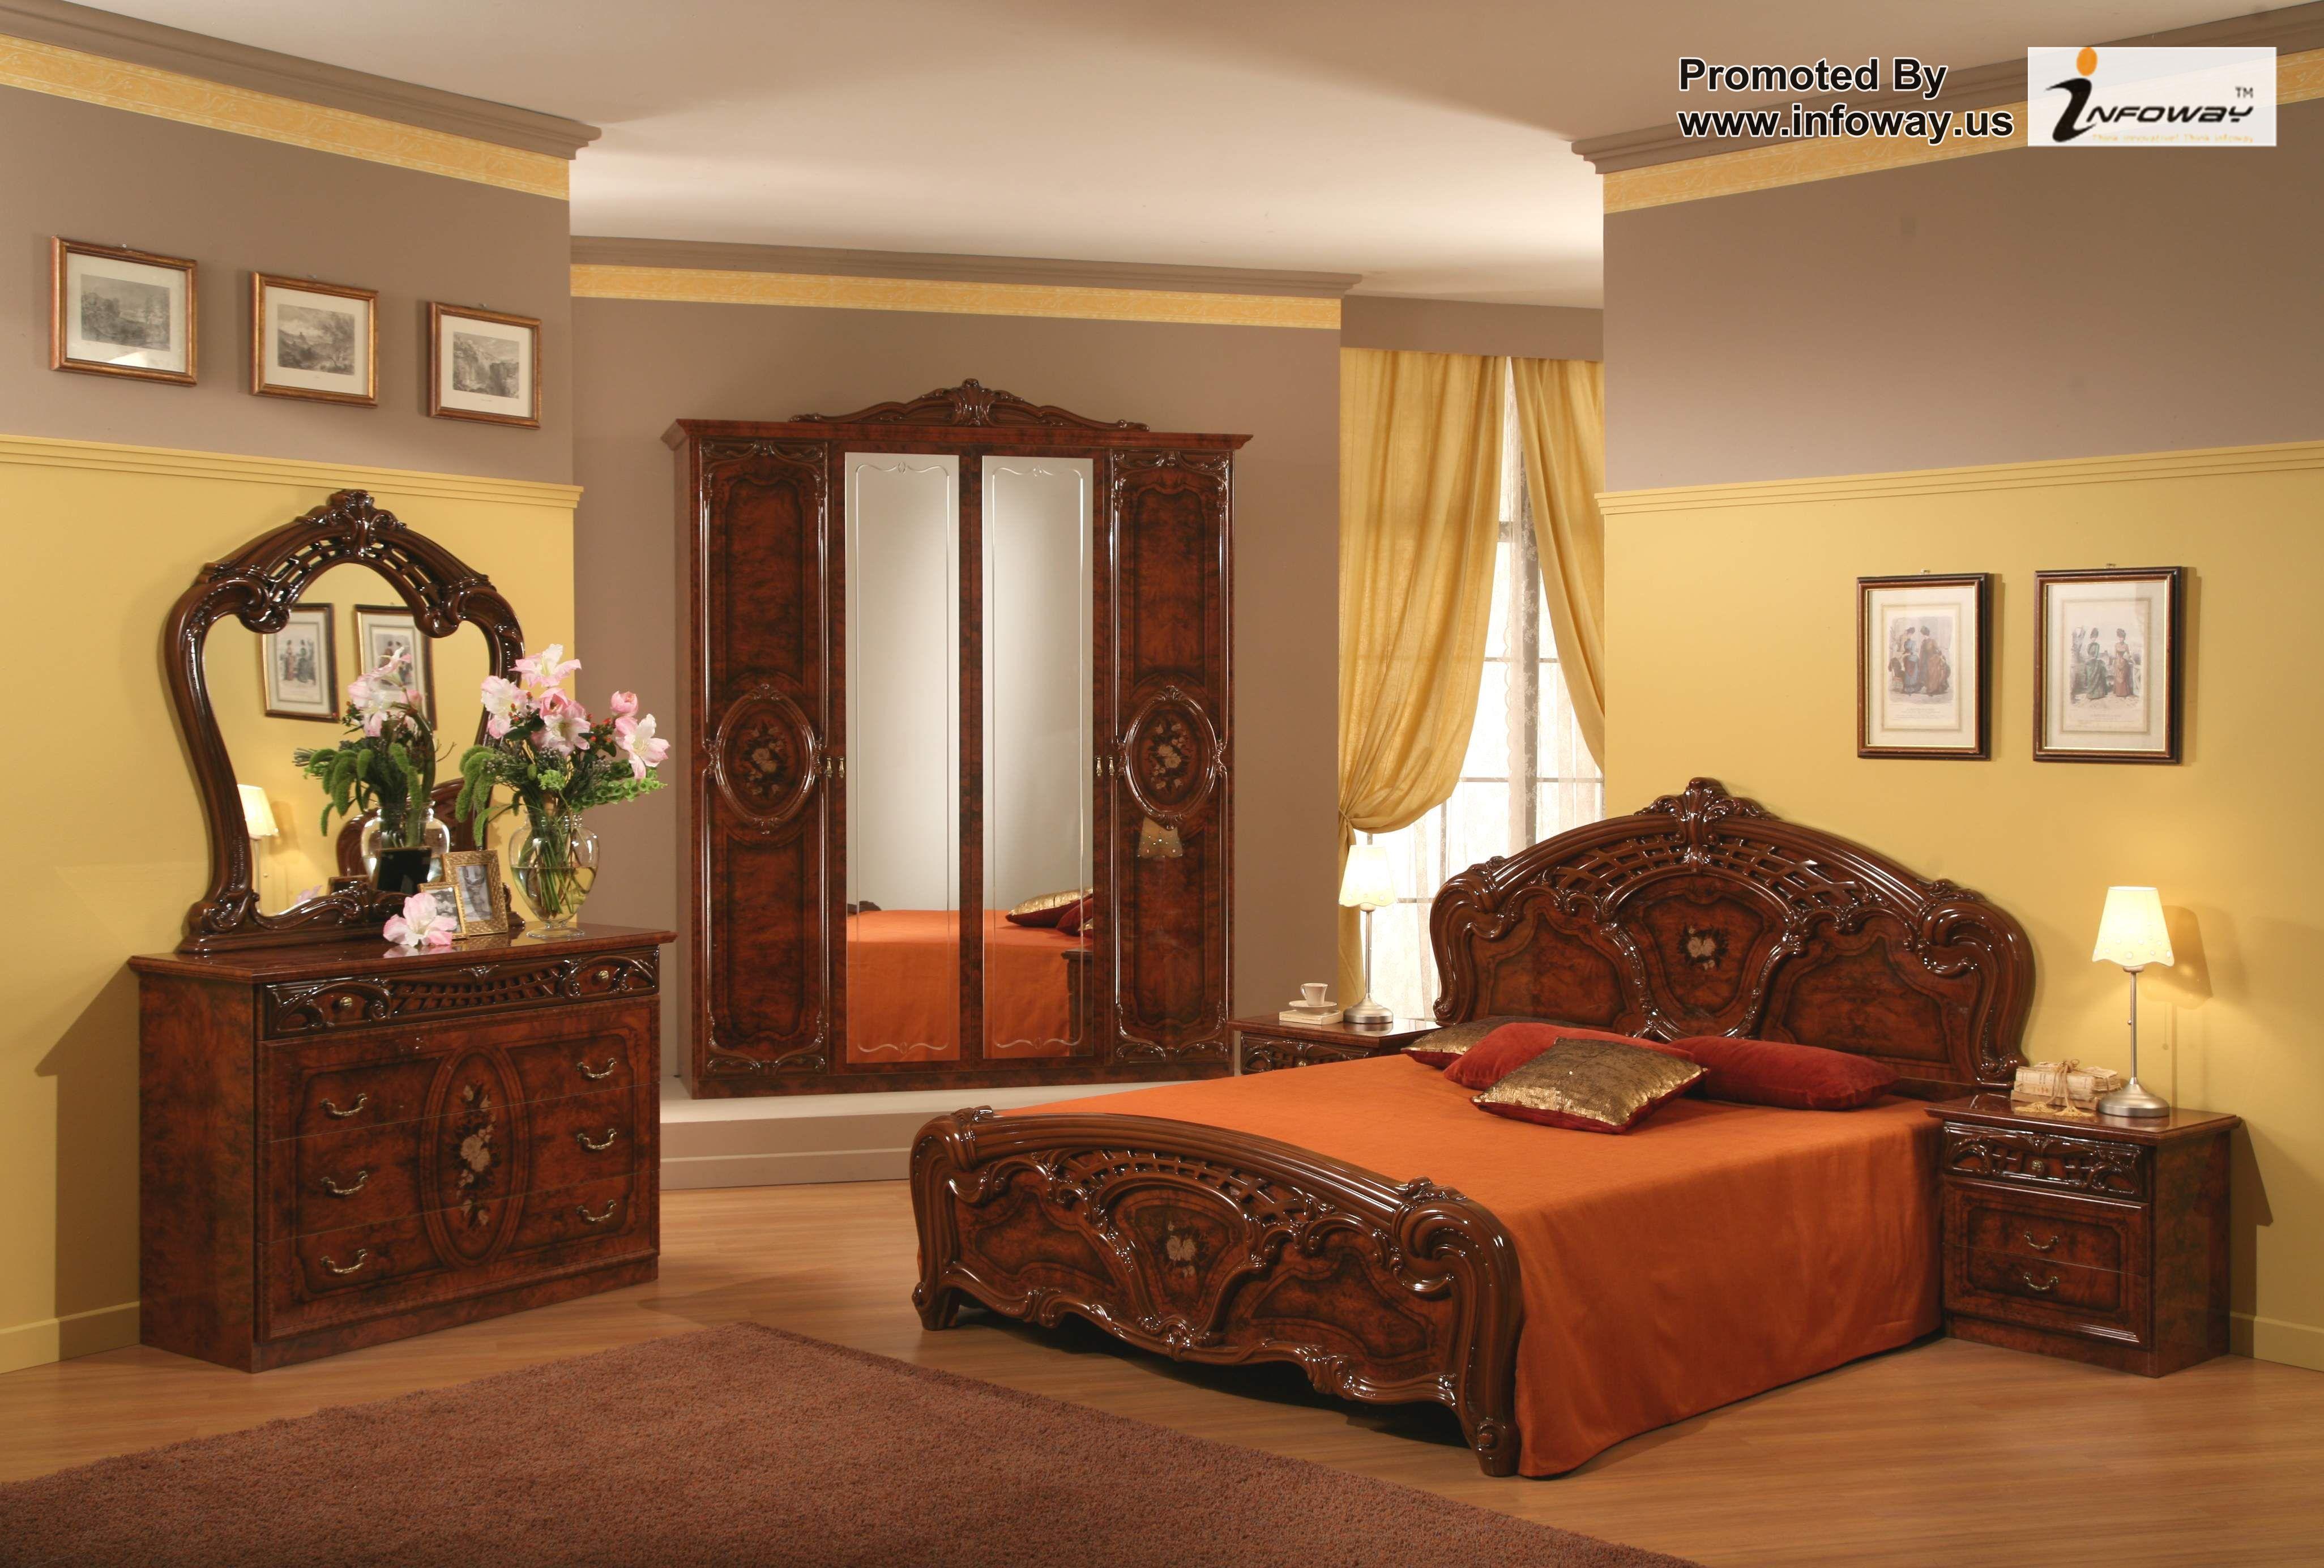 Master bedroom furniture layout  Amazing  Boudoir  Pinterest  Boudoir